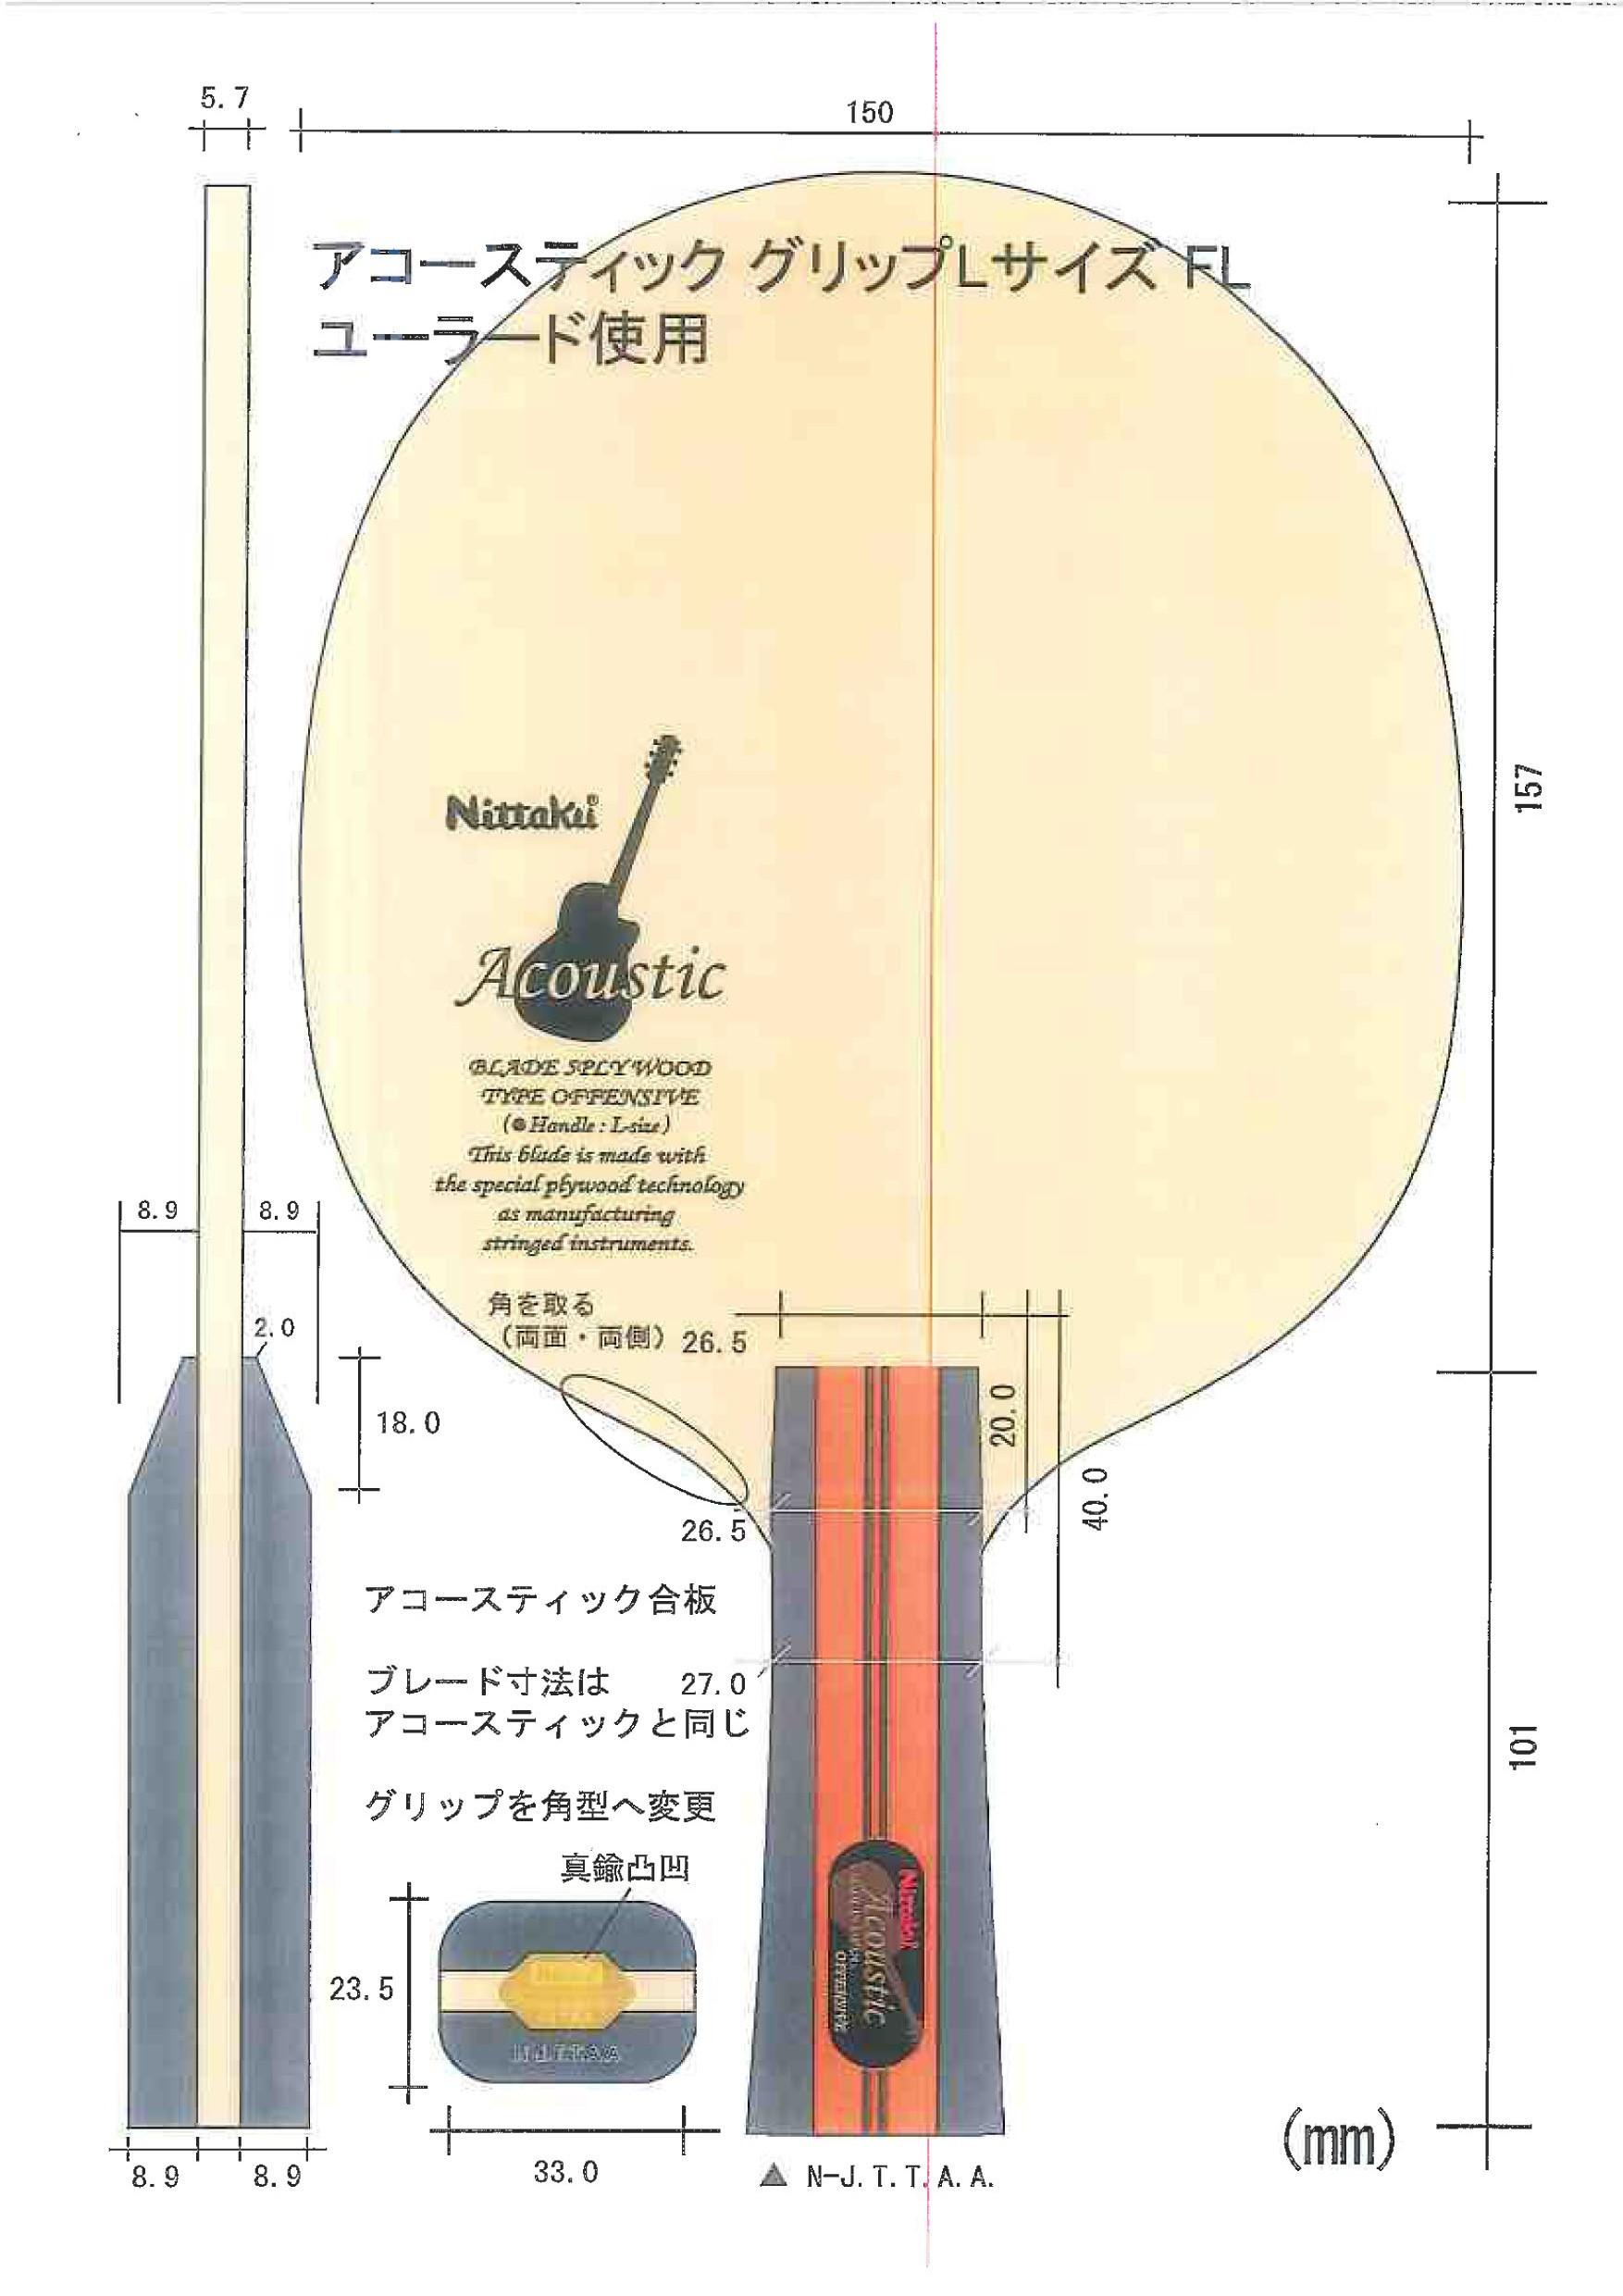 Nittaku Acoustic Carbon Lg Large Handle Tabletennis11